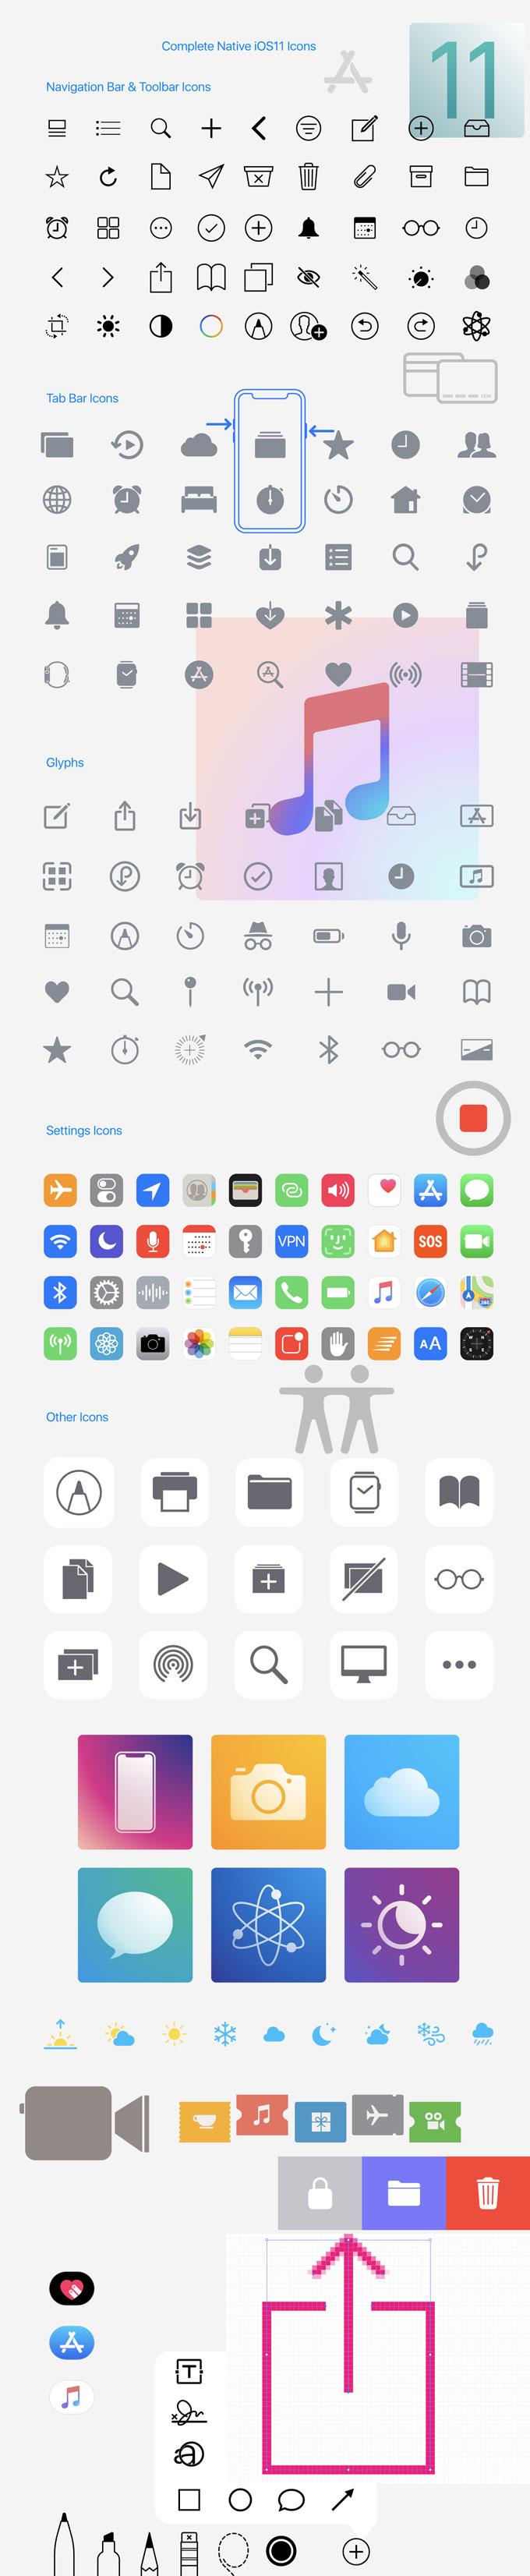 Free Native iOS10 & iOS11 Icons Pack